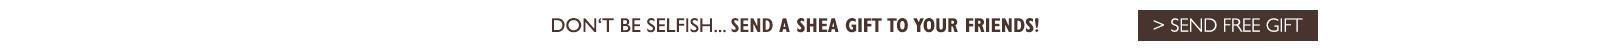 Use code SHEA98463